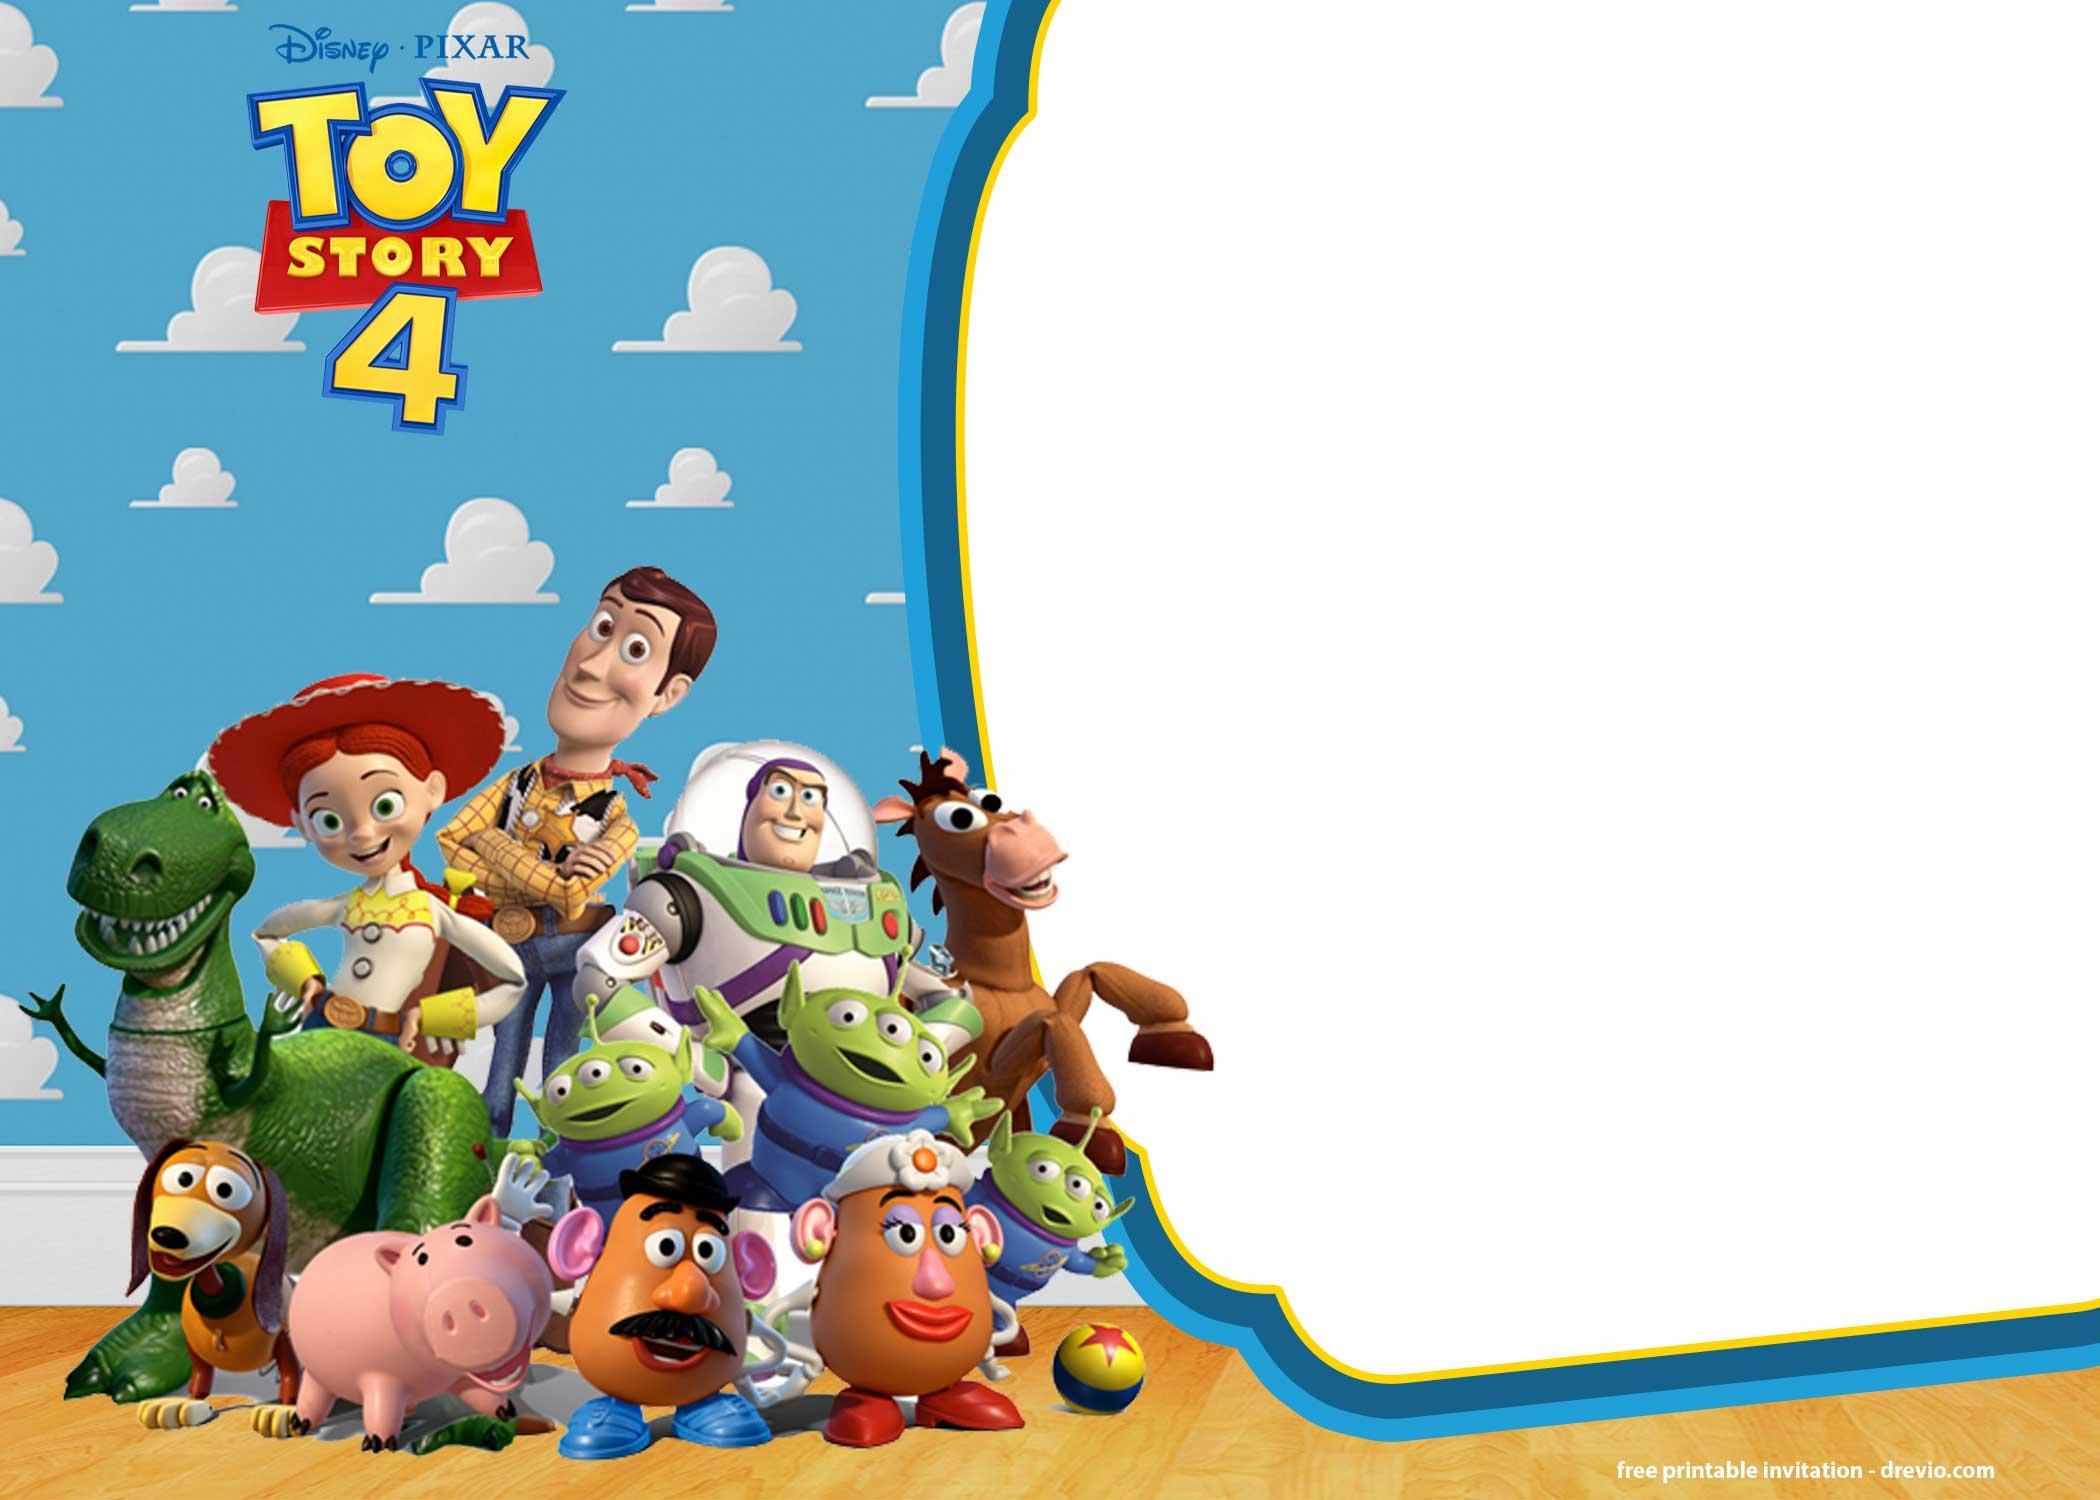 FREE Printable Toy Story 4 Invitation Templates FREE Invitation Templates Drevio